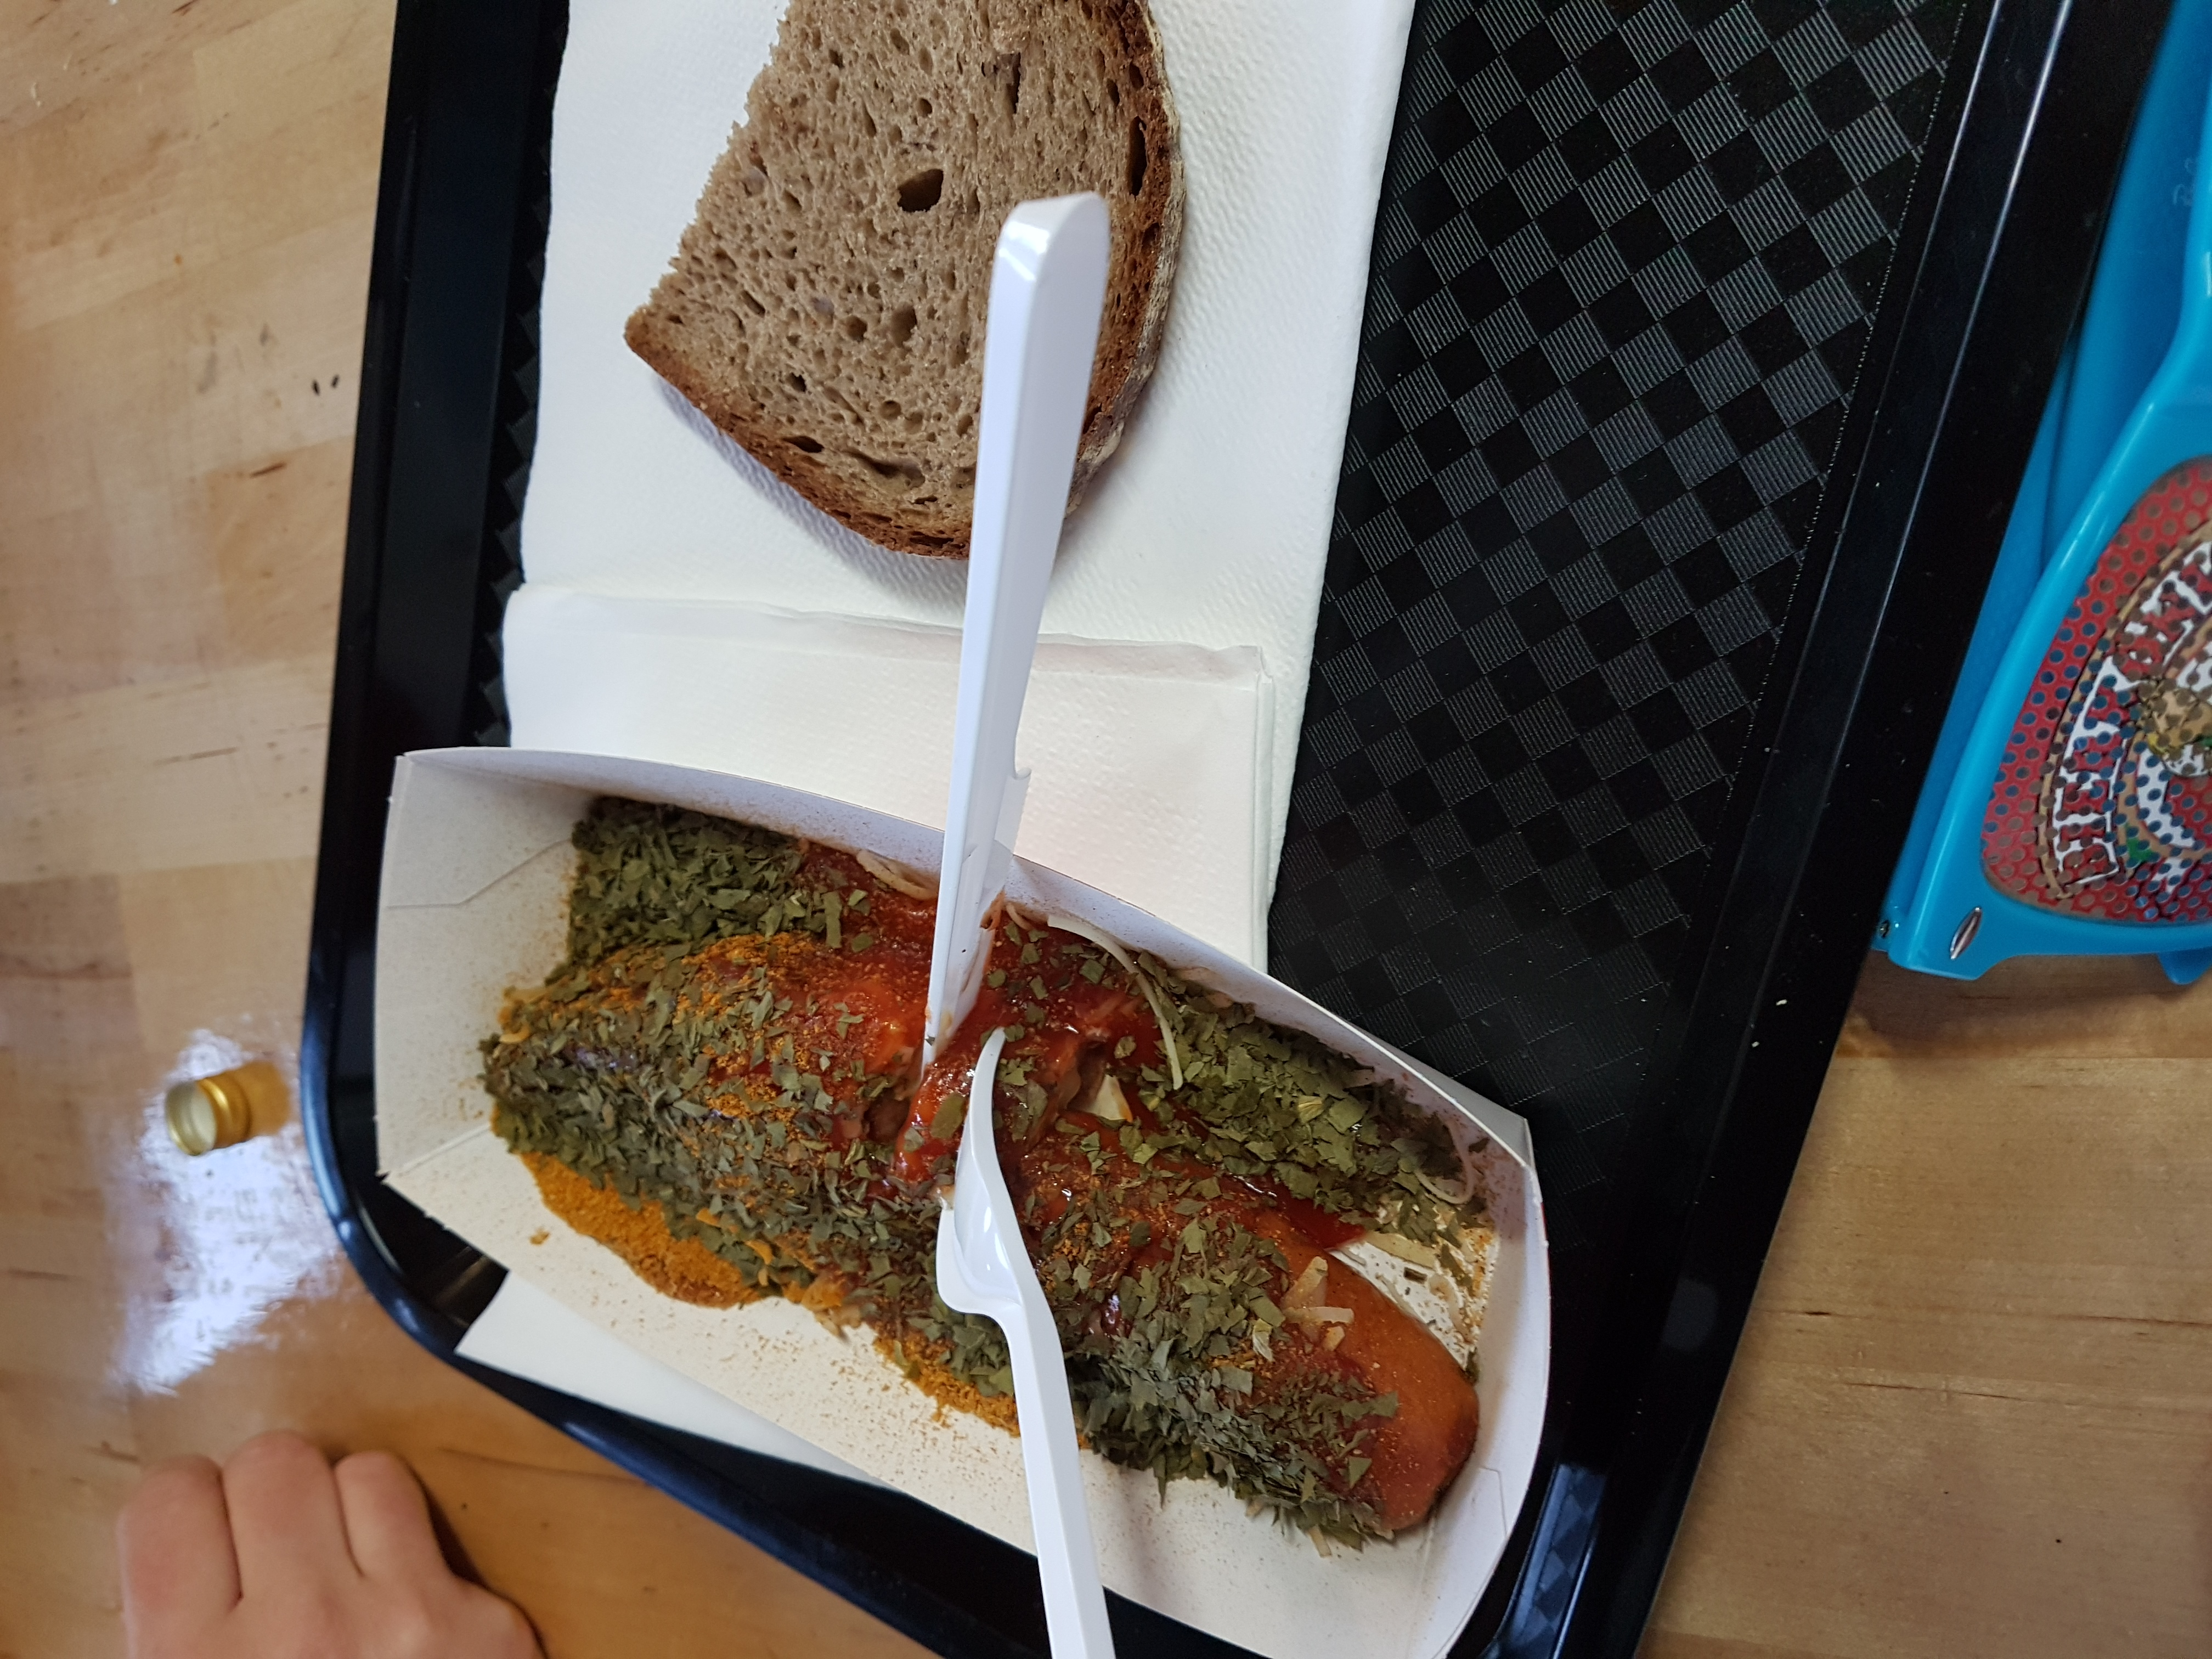 http://foodloader.net/Holz_2017-04-22_DJ_Duese_Wurst_2.jpg